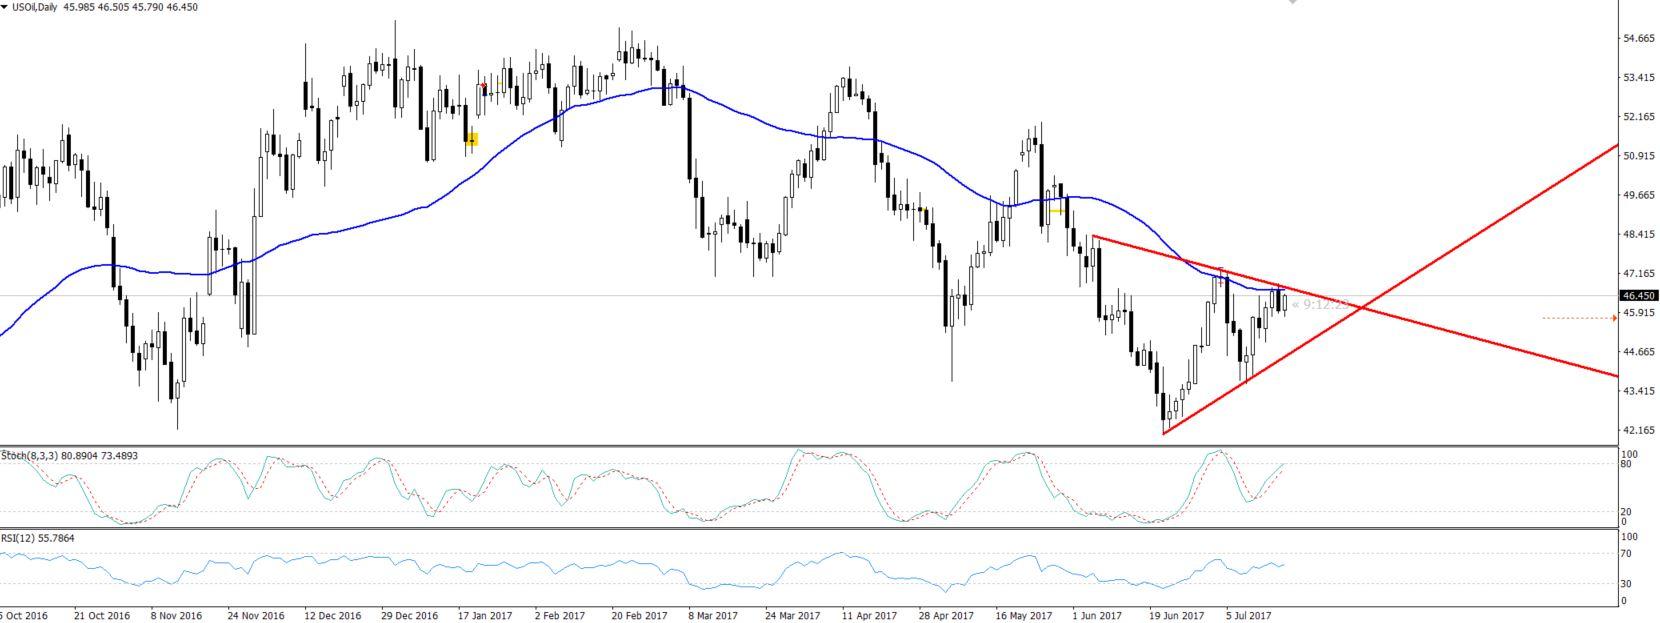 Crude Oil - Daily Chart - Symmetric Triangle Pattern